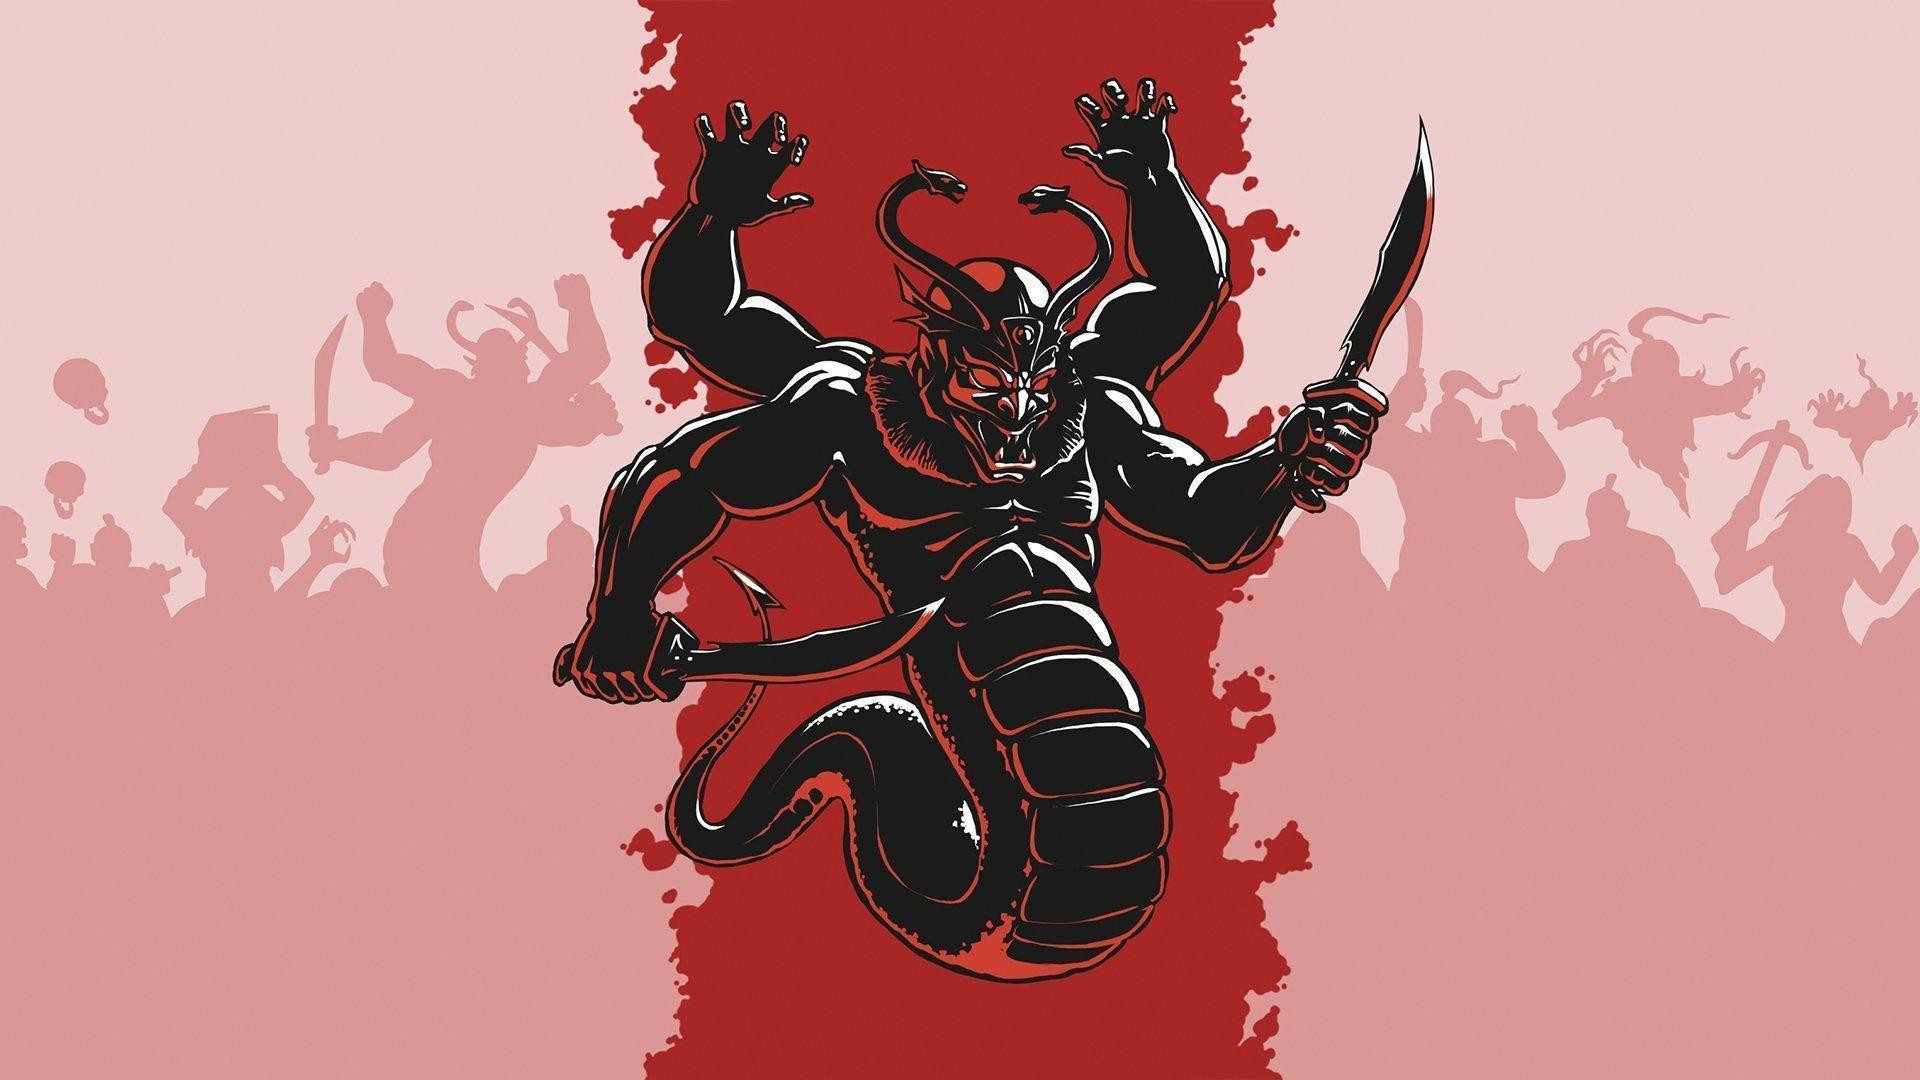 Res: 1920x1080, Shadow Fight Wallpaper - WallpaperSafari